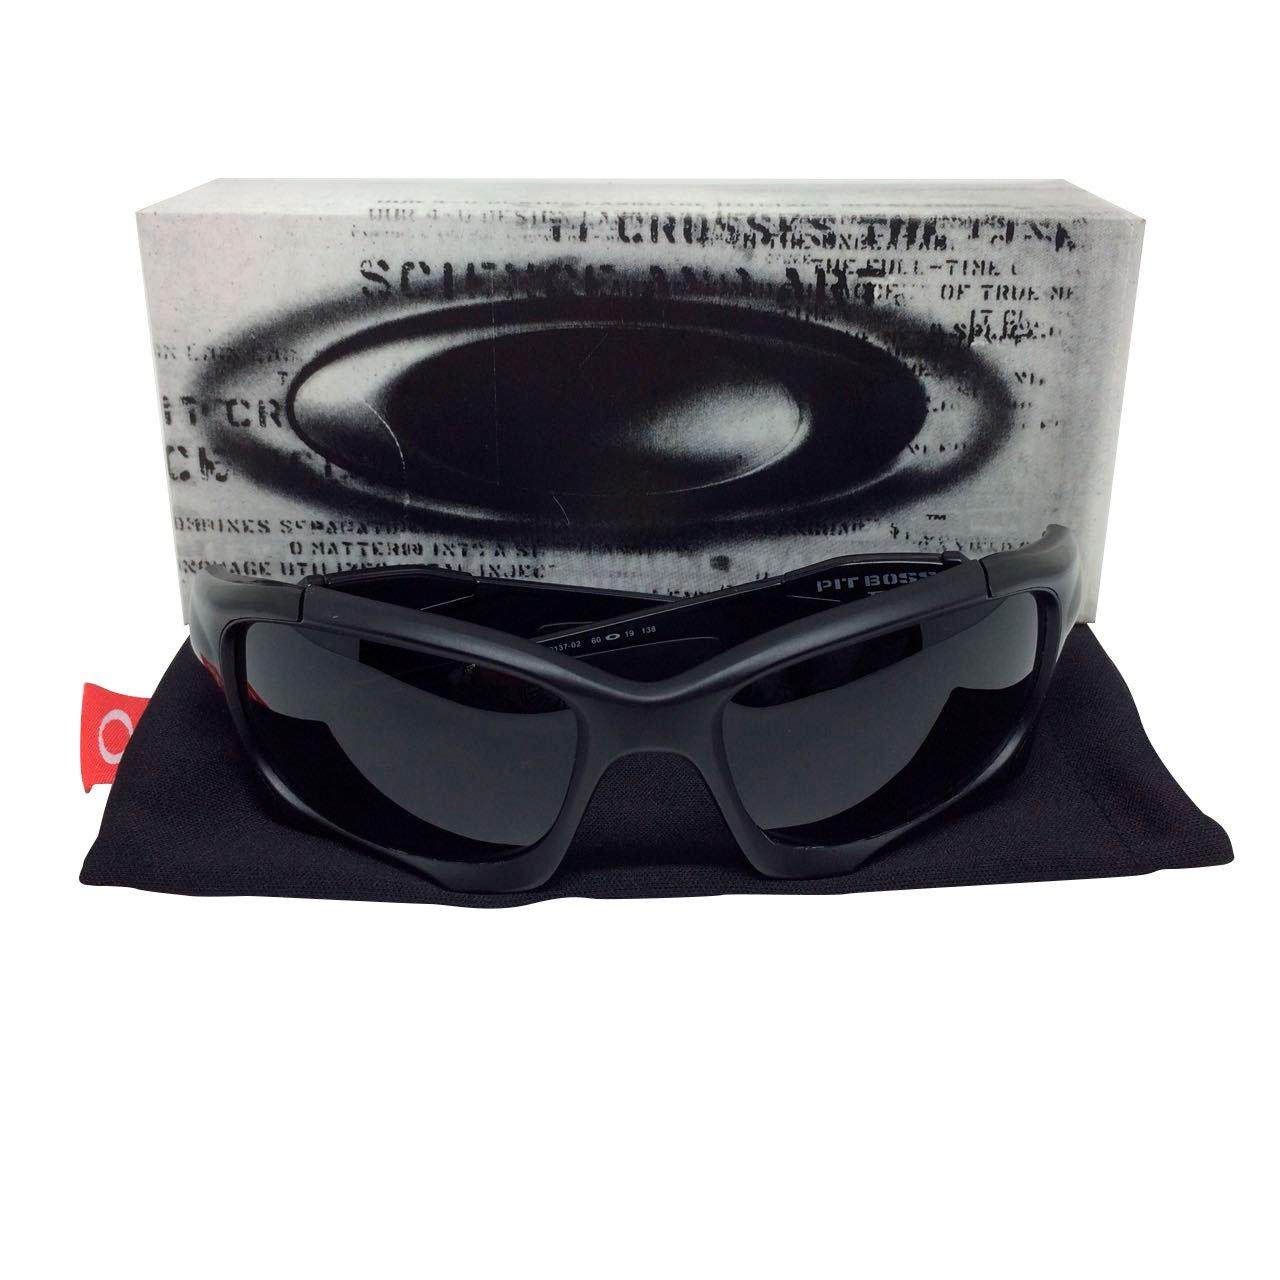 9d32505d3cea9 Óculos Oakley Pit Boss 2 lente preta – Sanfer Acessórios